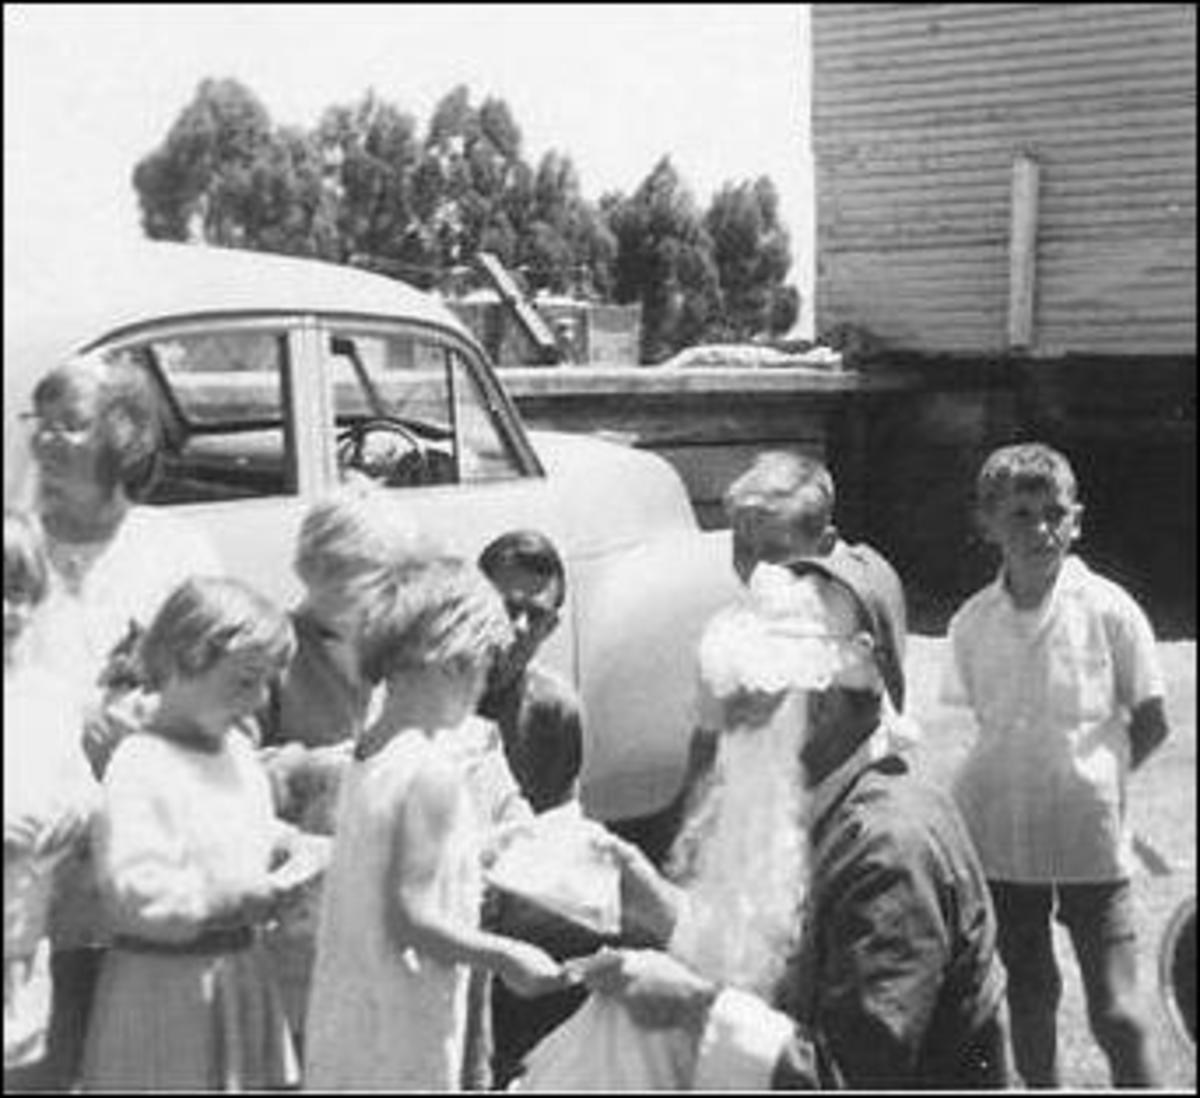 Meeting Santa at Christmas in Australia 1967